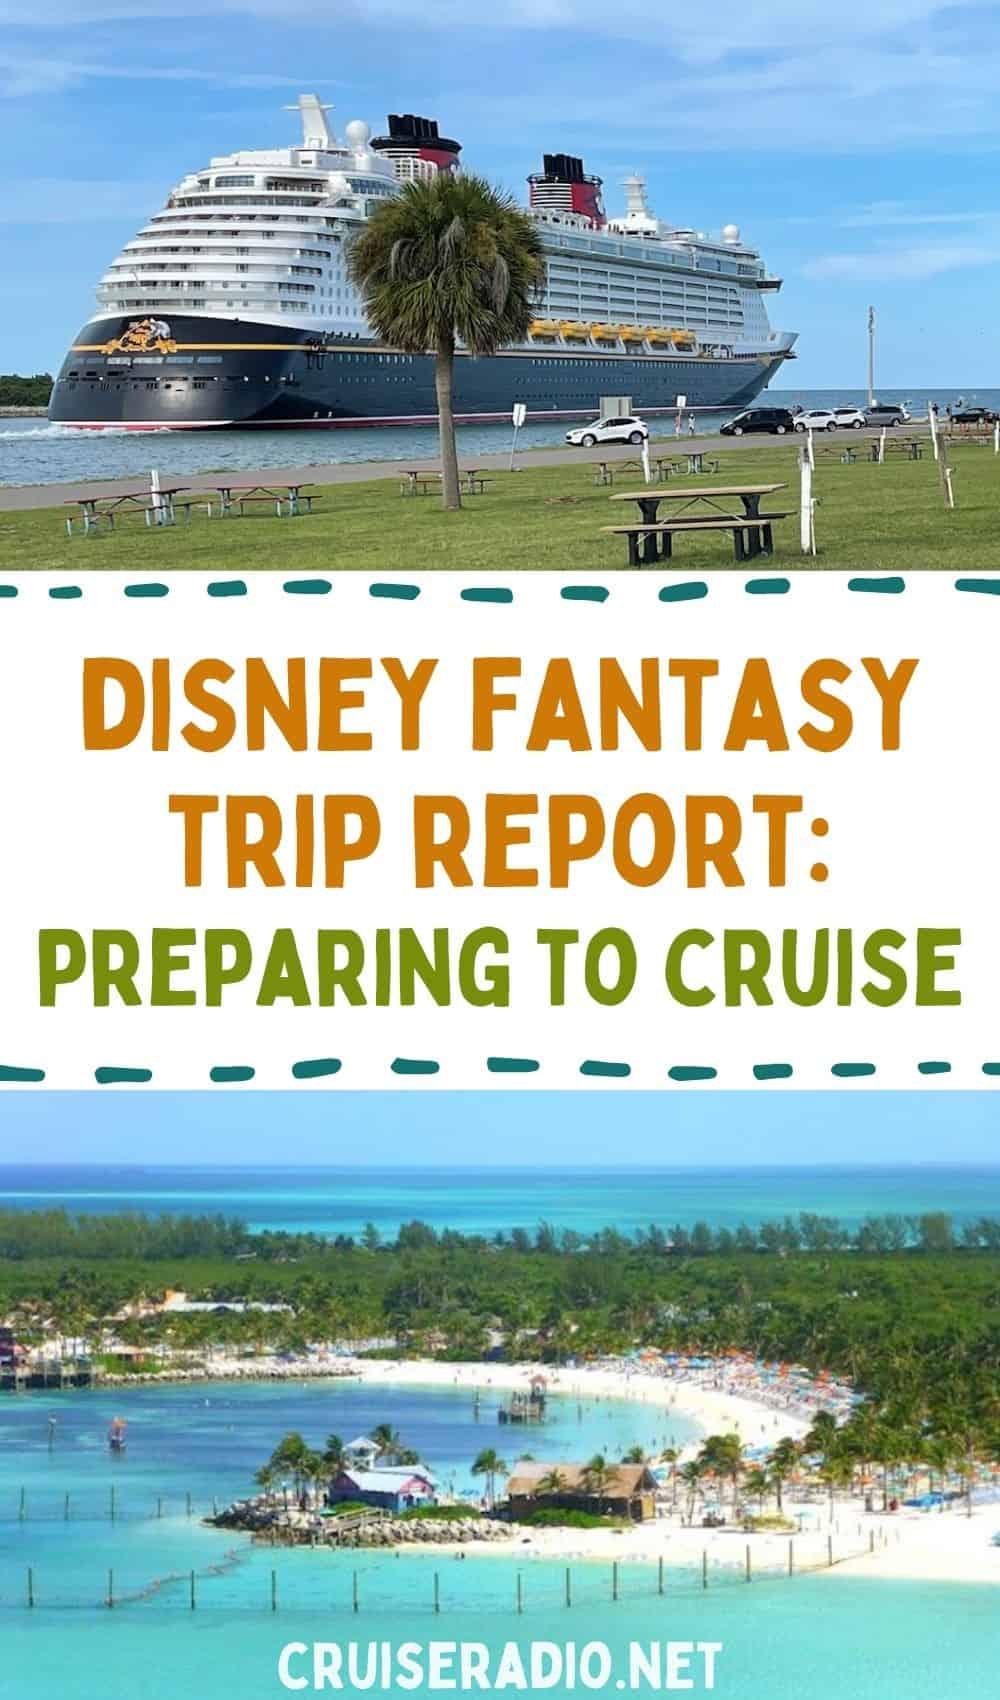 disney fantasy trip report: preparing to cruise